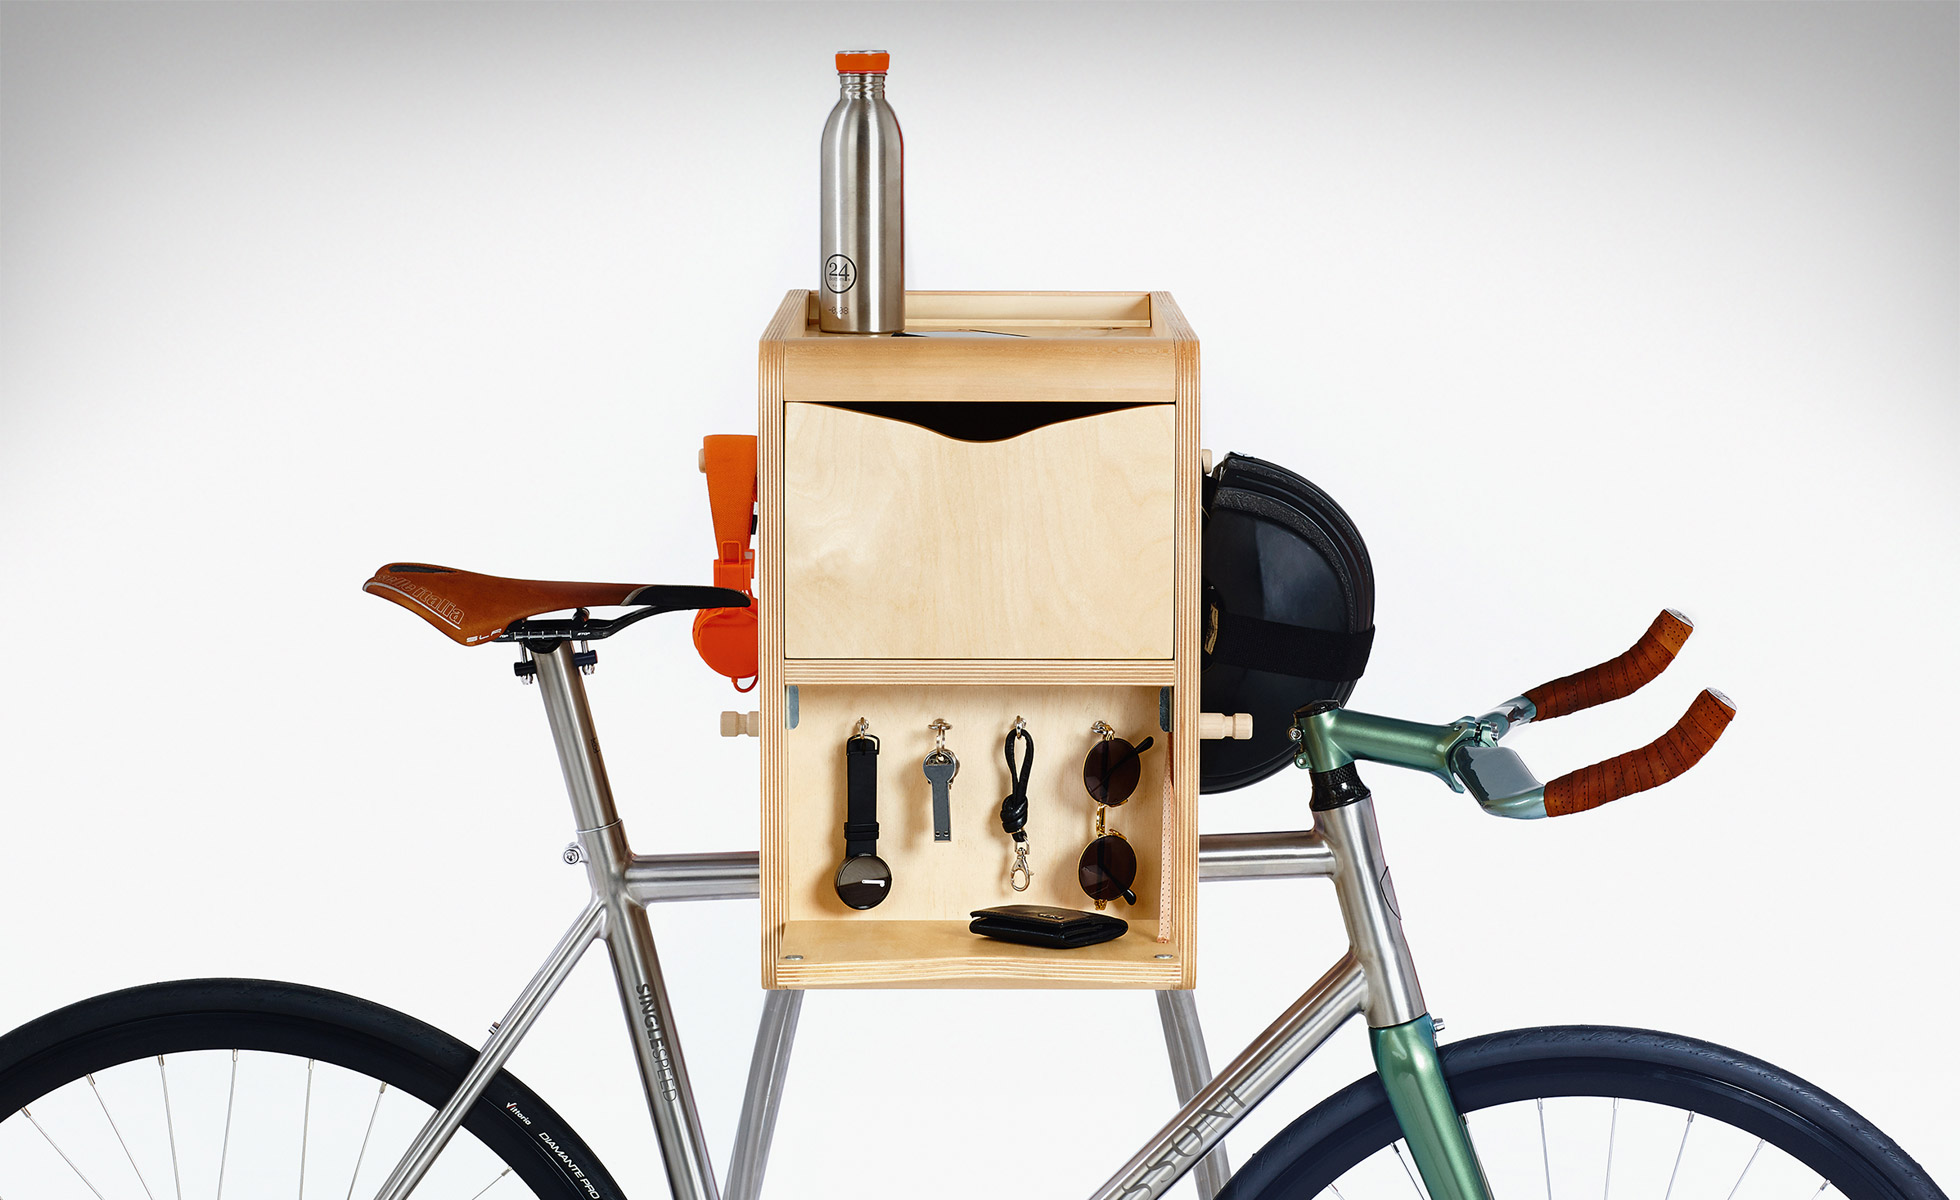 Milano design week doppelganger gangherista Vadolibero Bike Butler 6